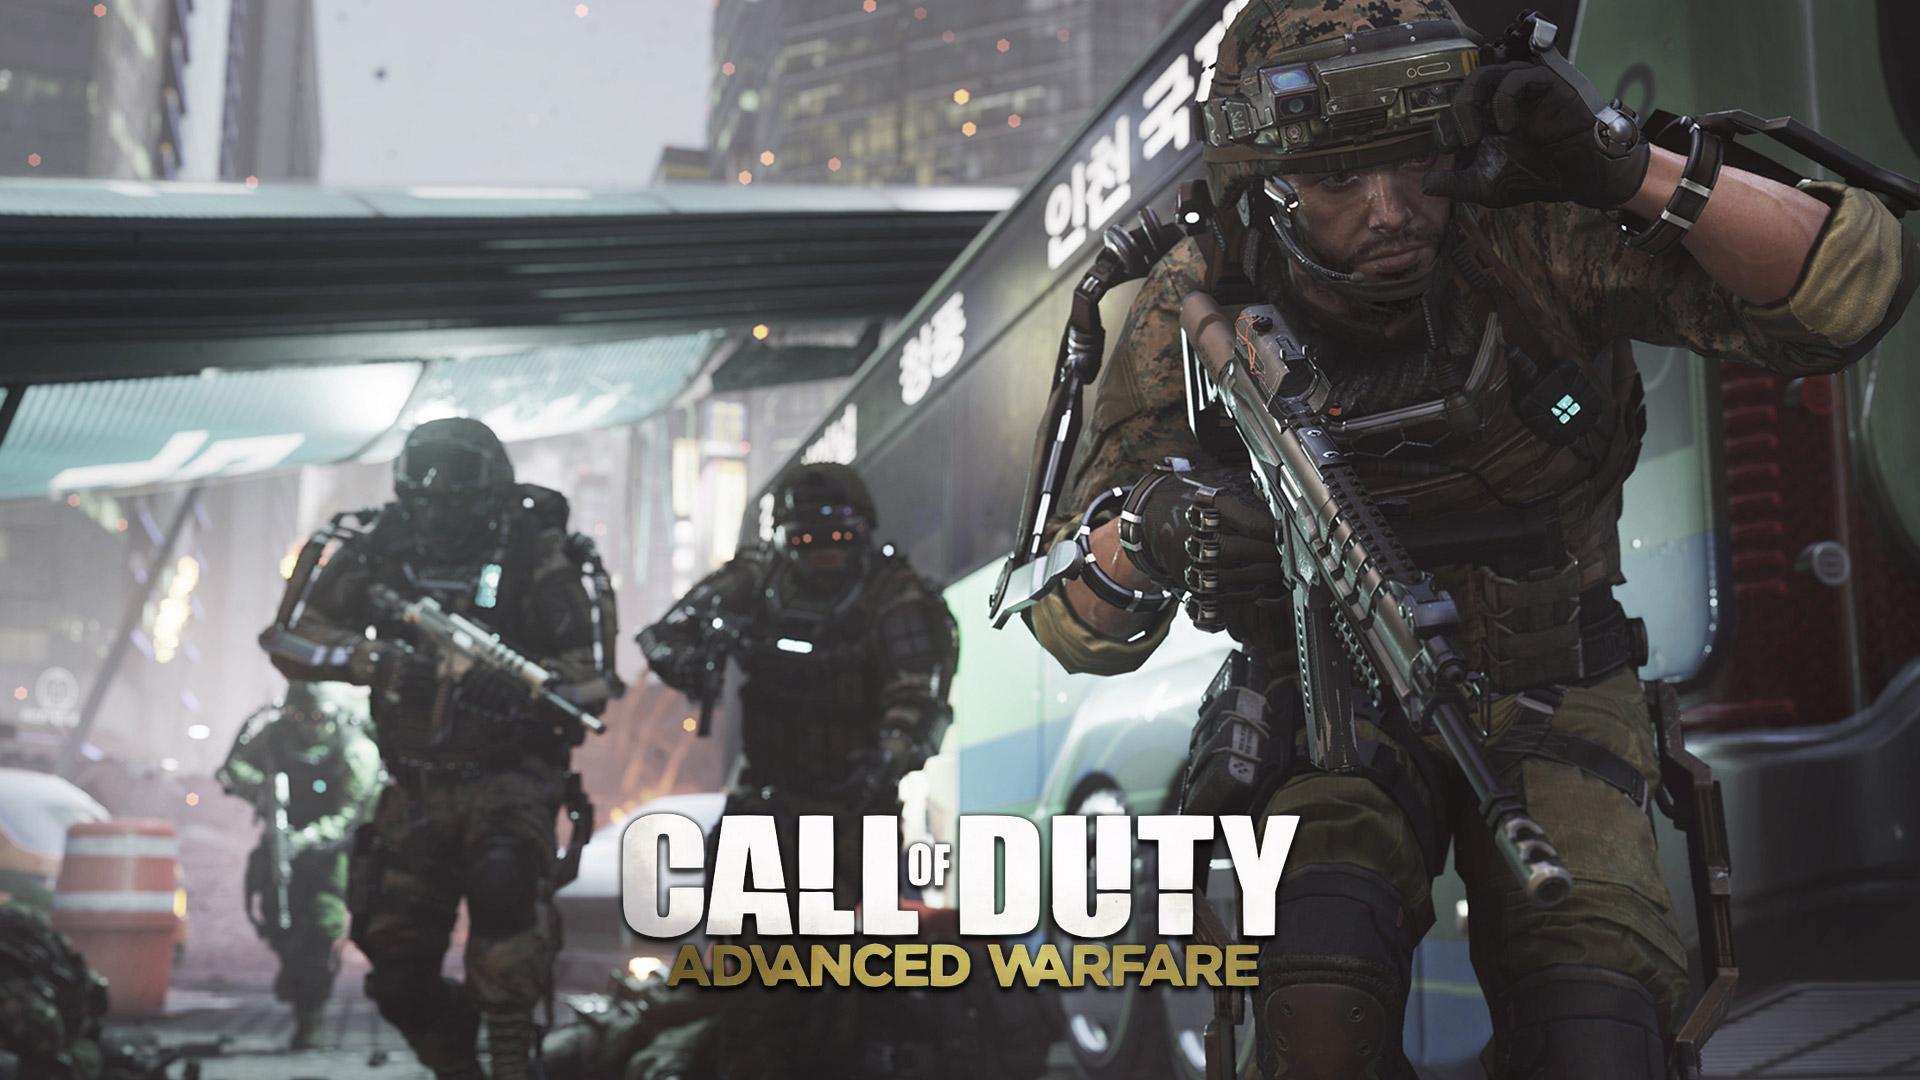 call of duty advanced warfare wallpaper iphone 6 plus